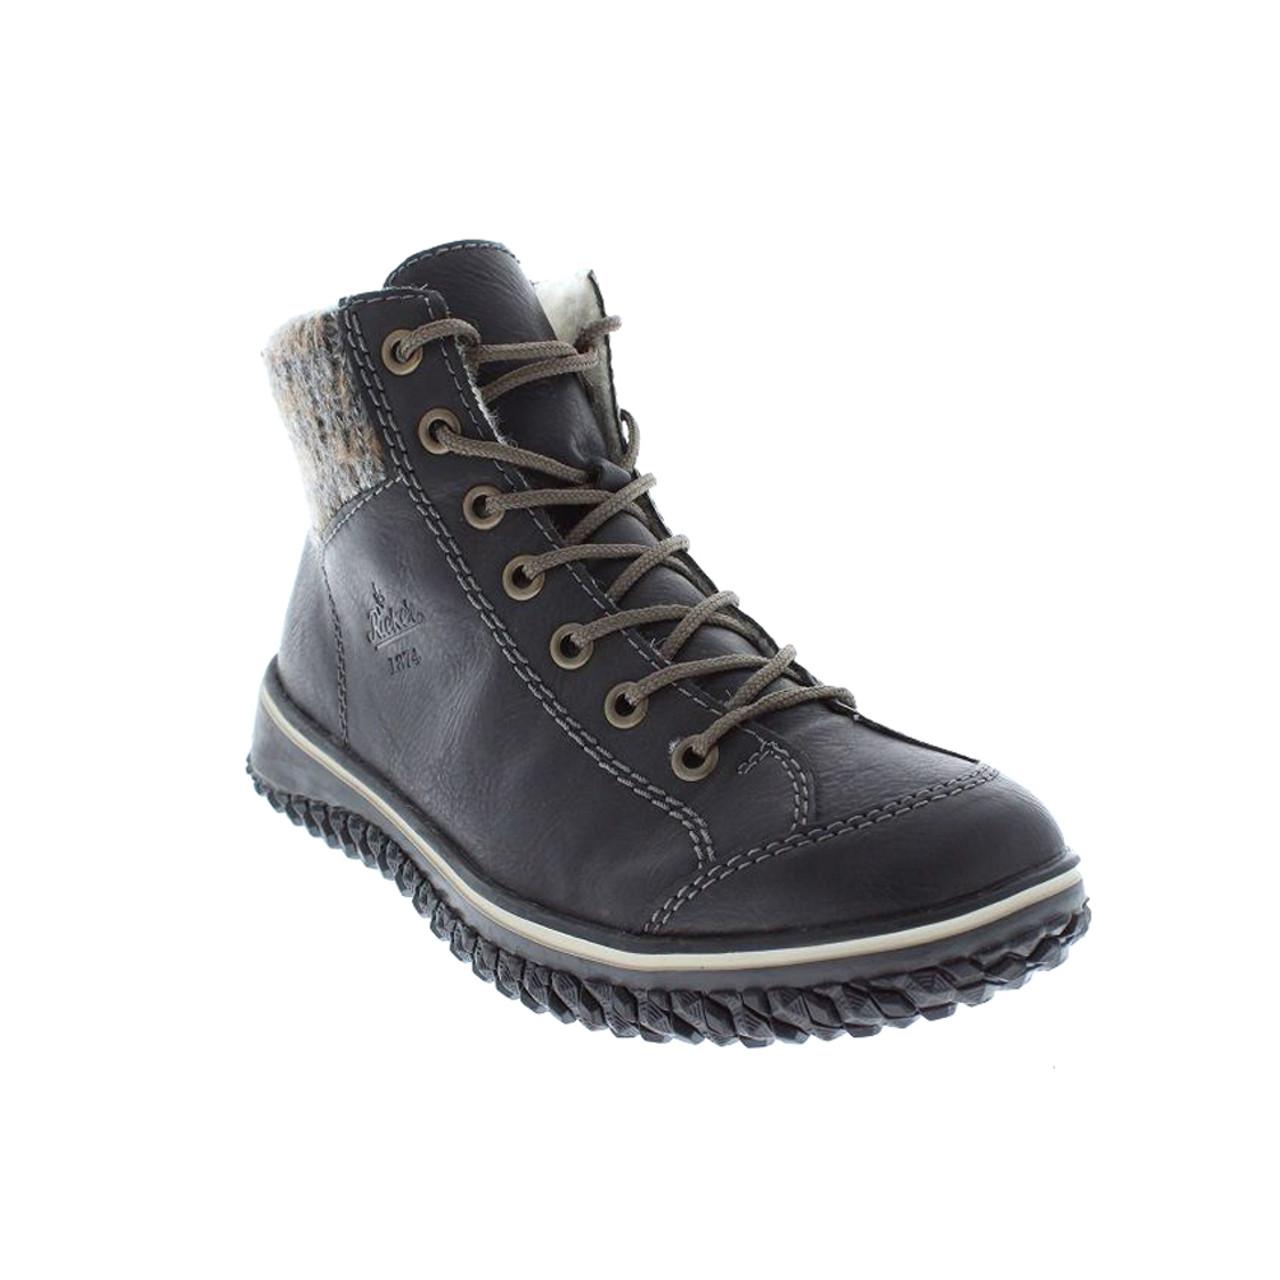 Rieker Women's Cordula 43 Ankle Boot